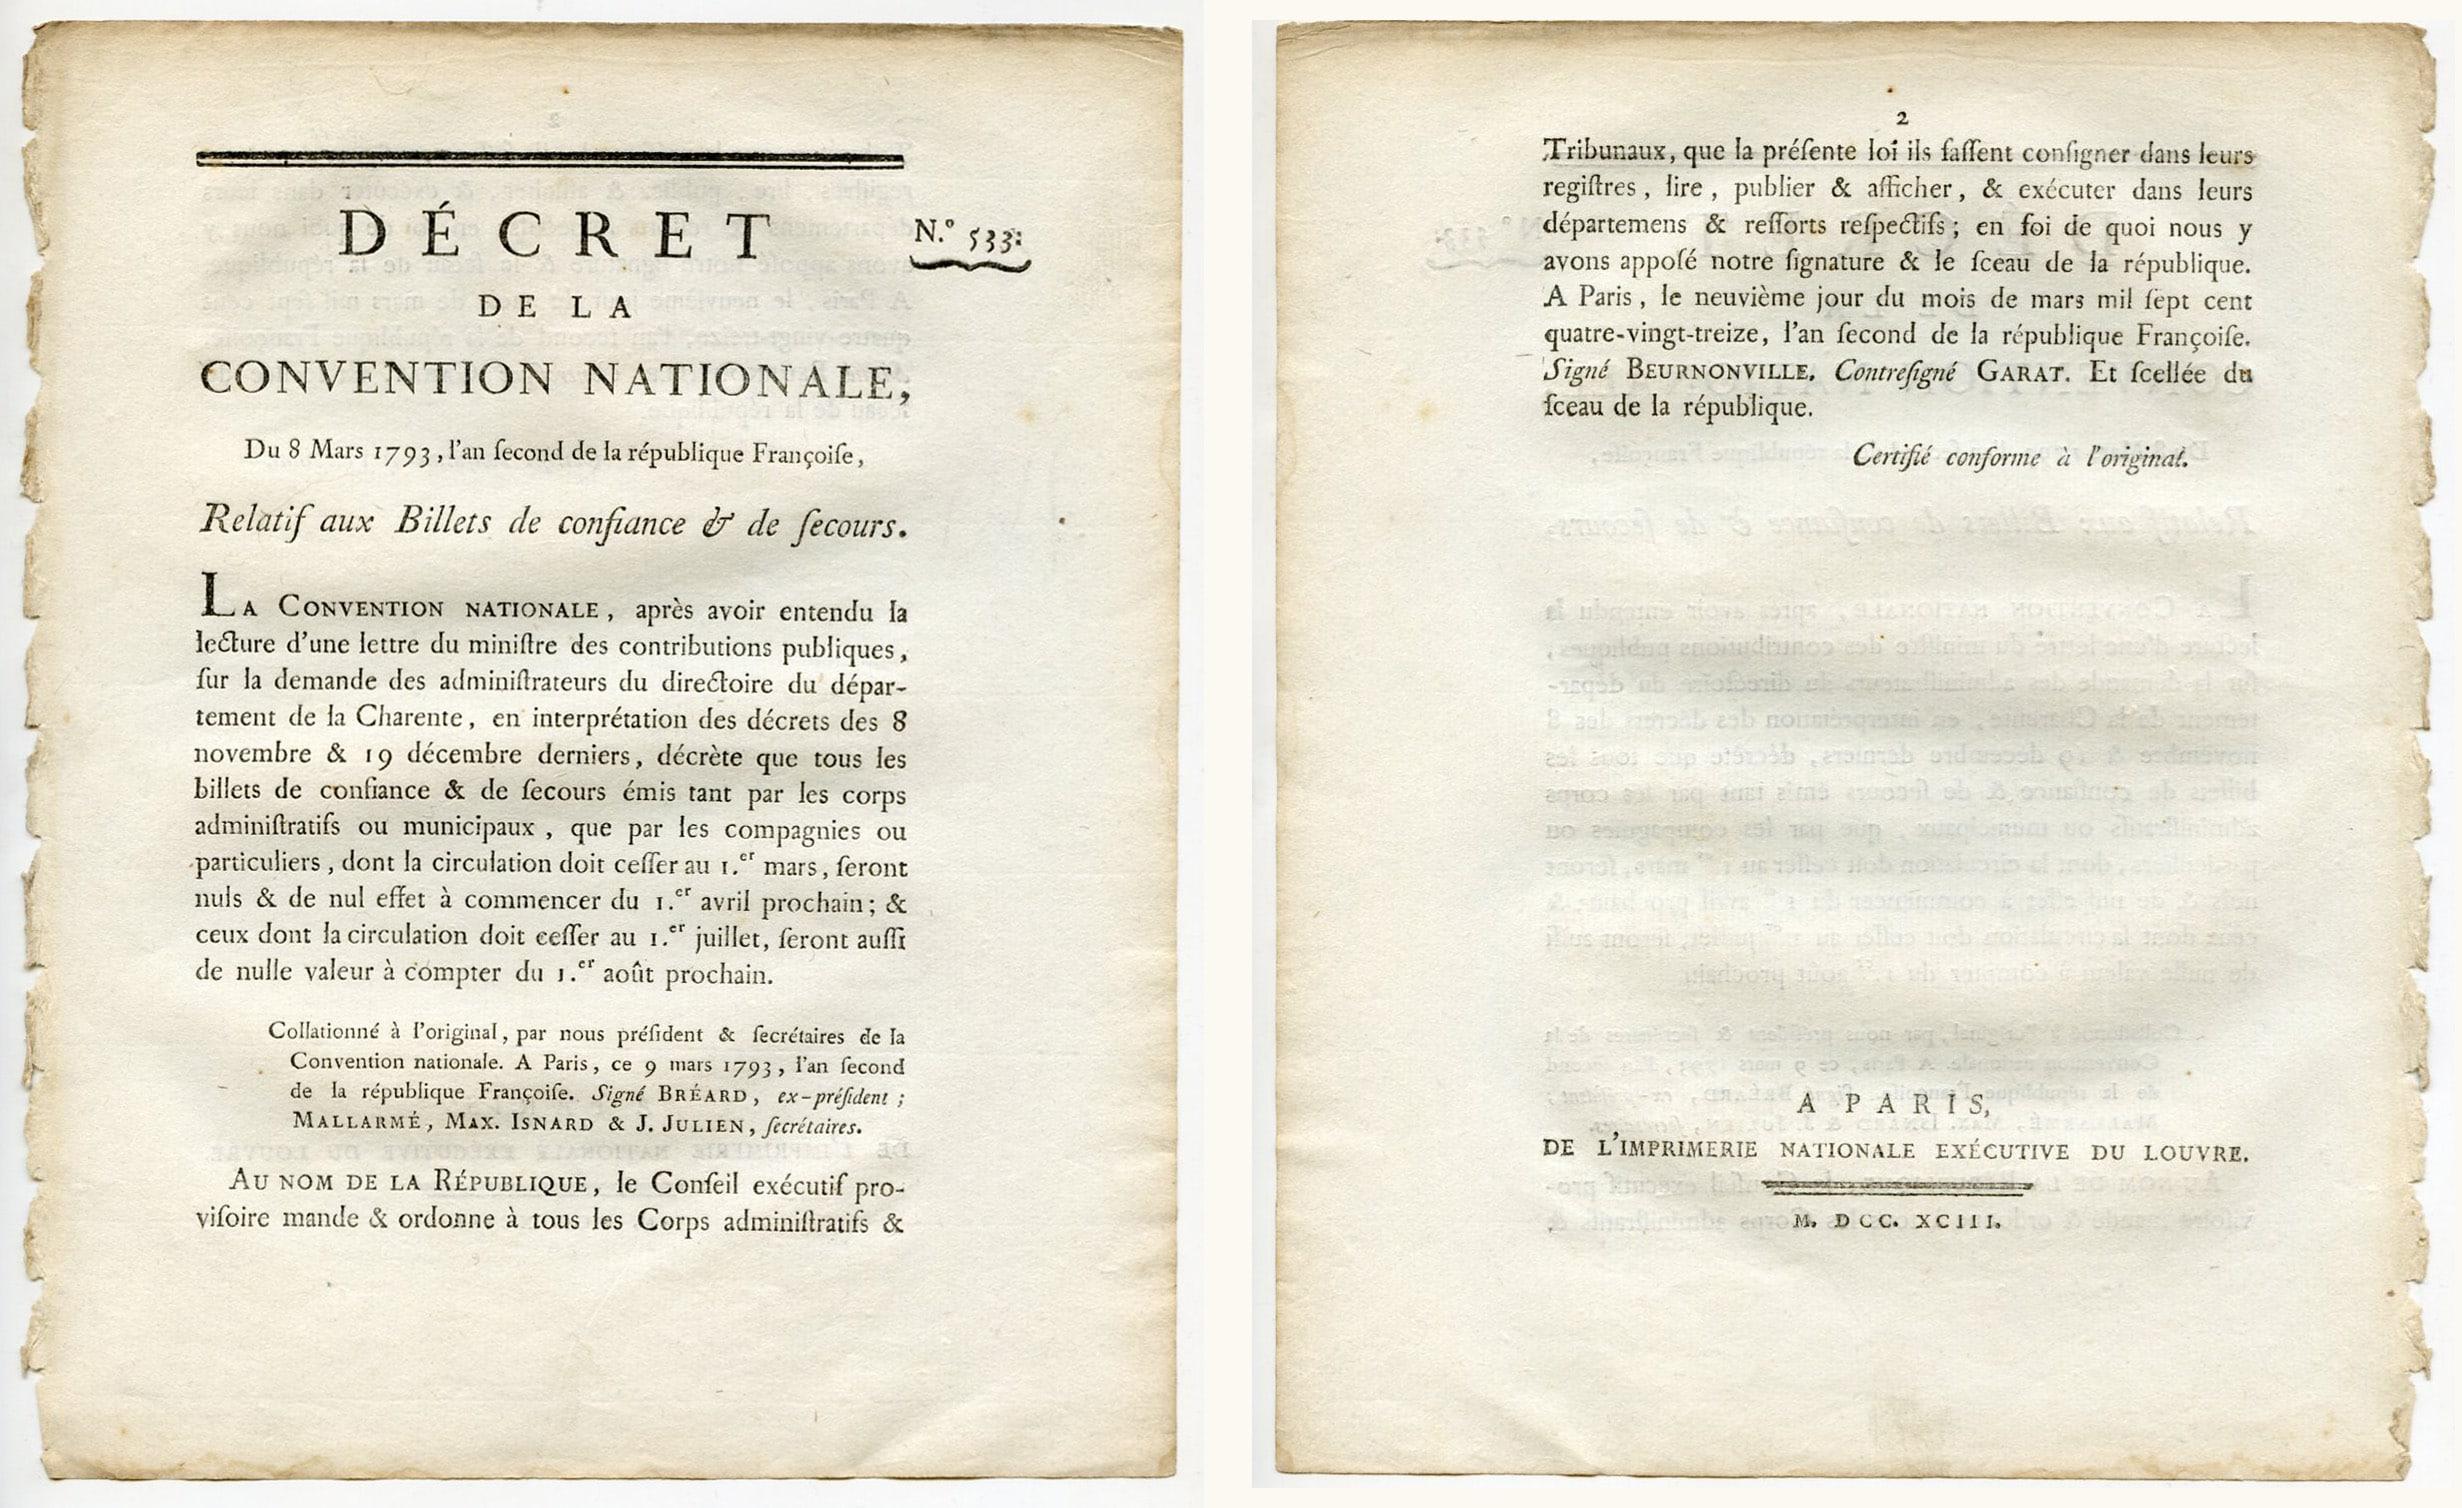 decret_du_8_mars_1793